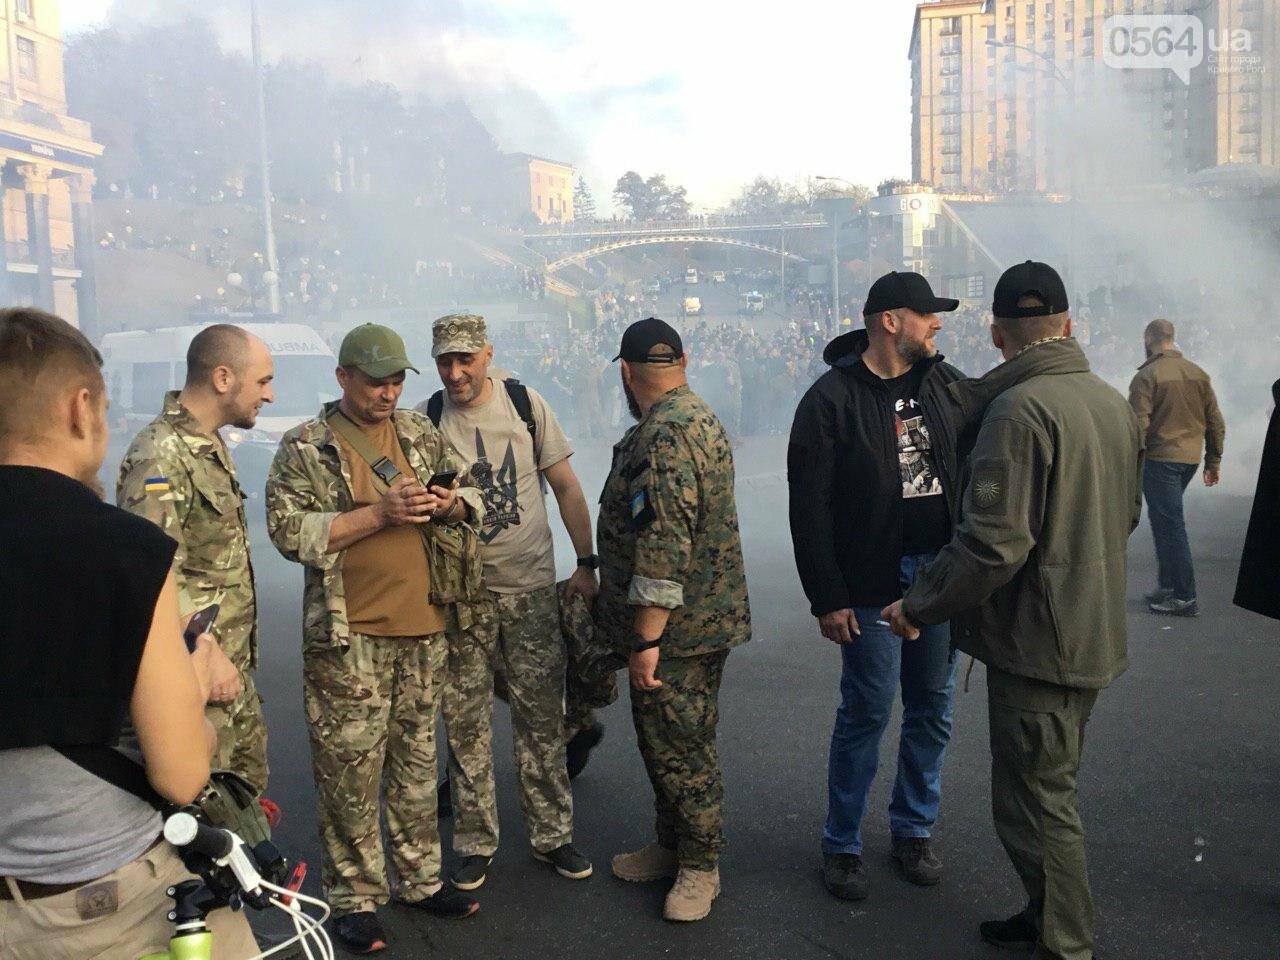 Криворожане поддержали Марш сопротивления капитуляции в Киеве, - ФОТО, ВИДЕО, ОБНОВЛЕНО, фото-28